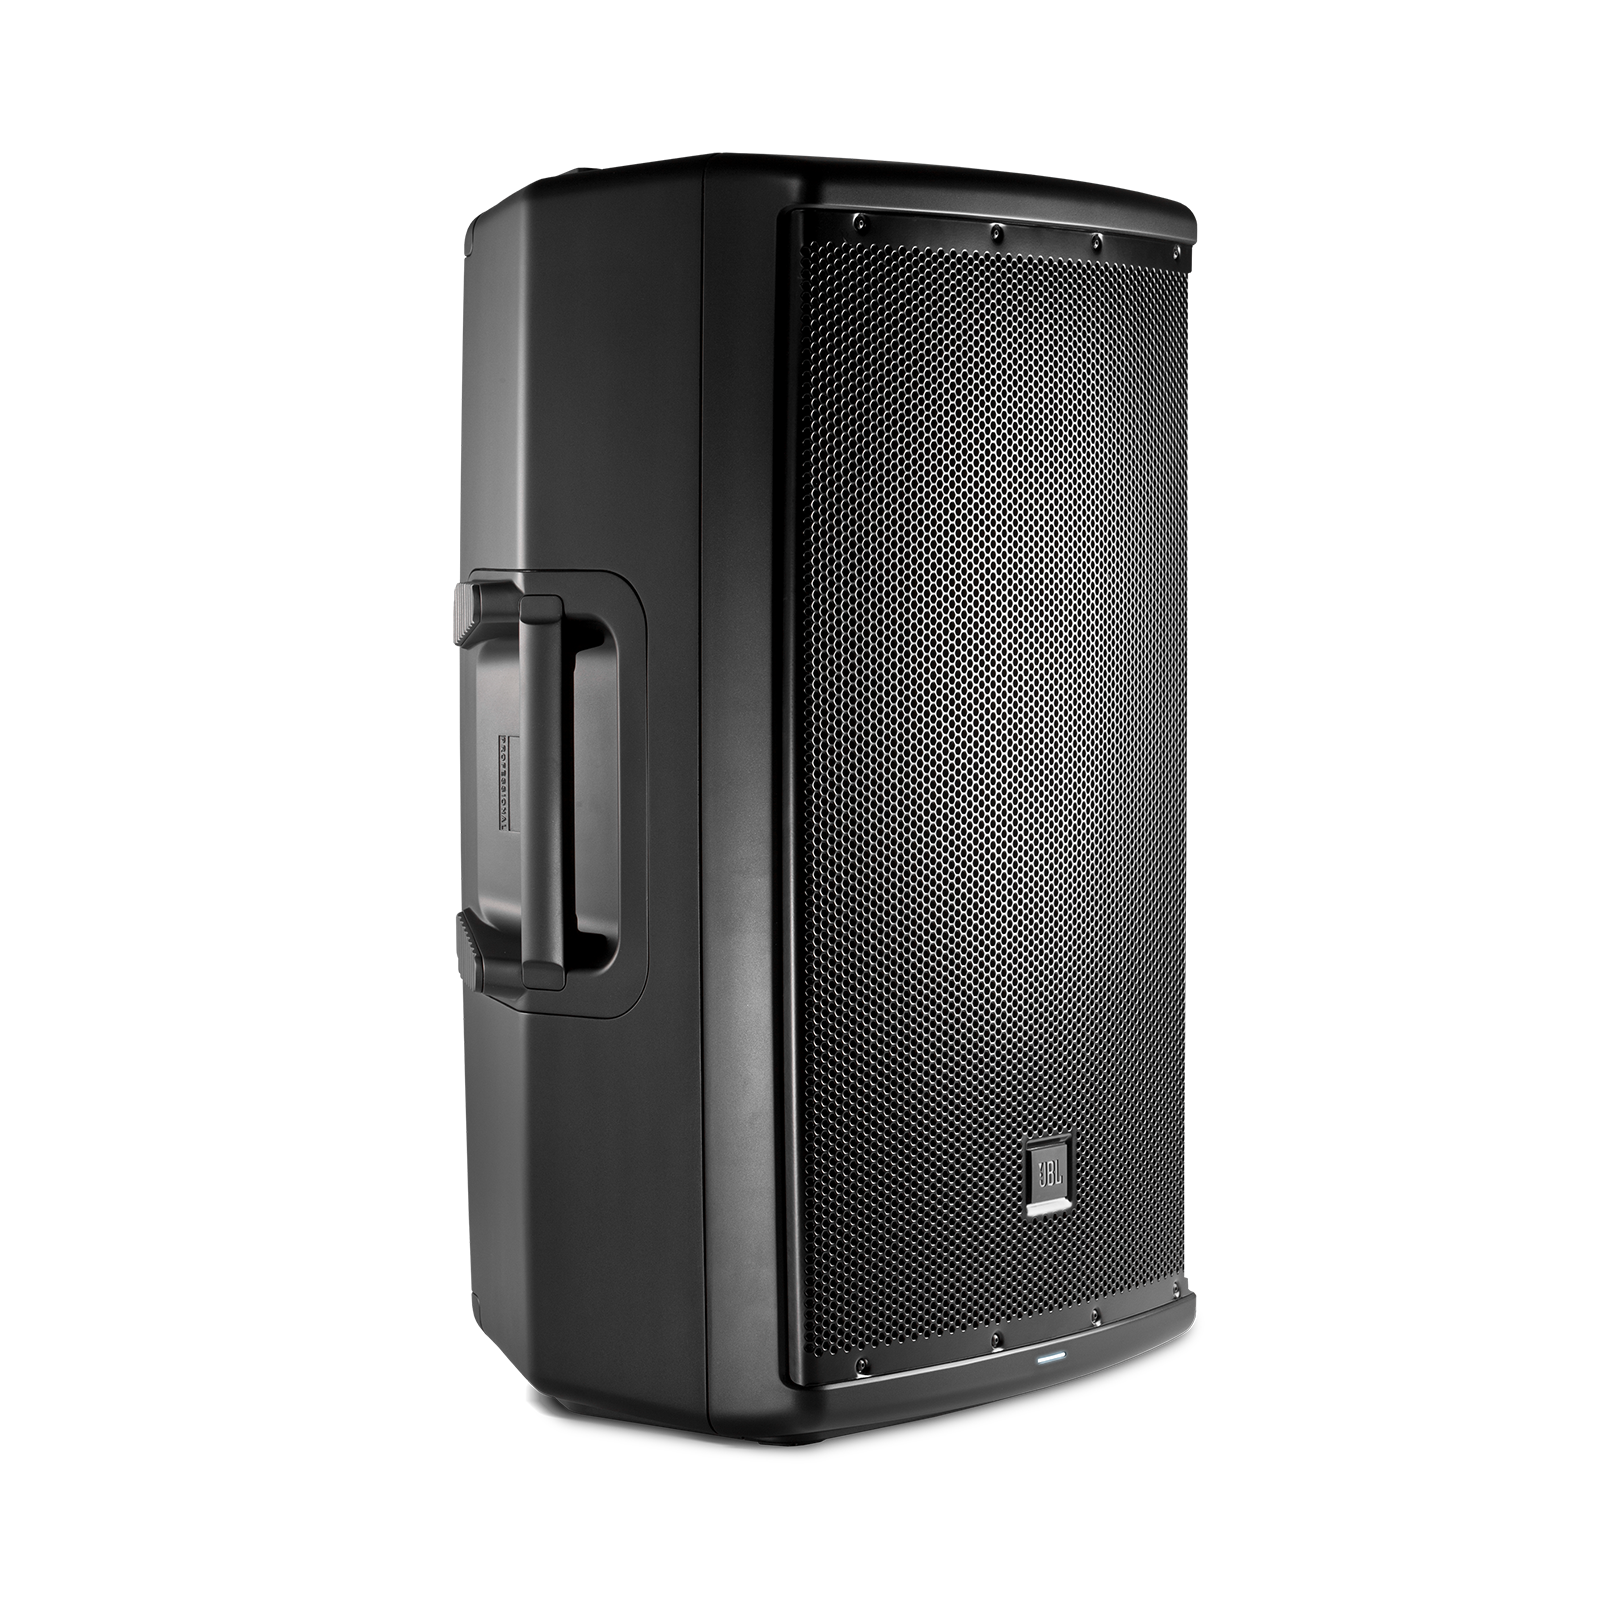 "JBL EON615 - Black - 15"" Two-Way Multipurpose Self-Powered Sound Reinforcement - Detailshot 1"